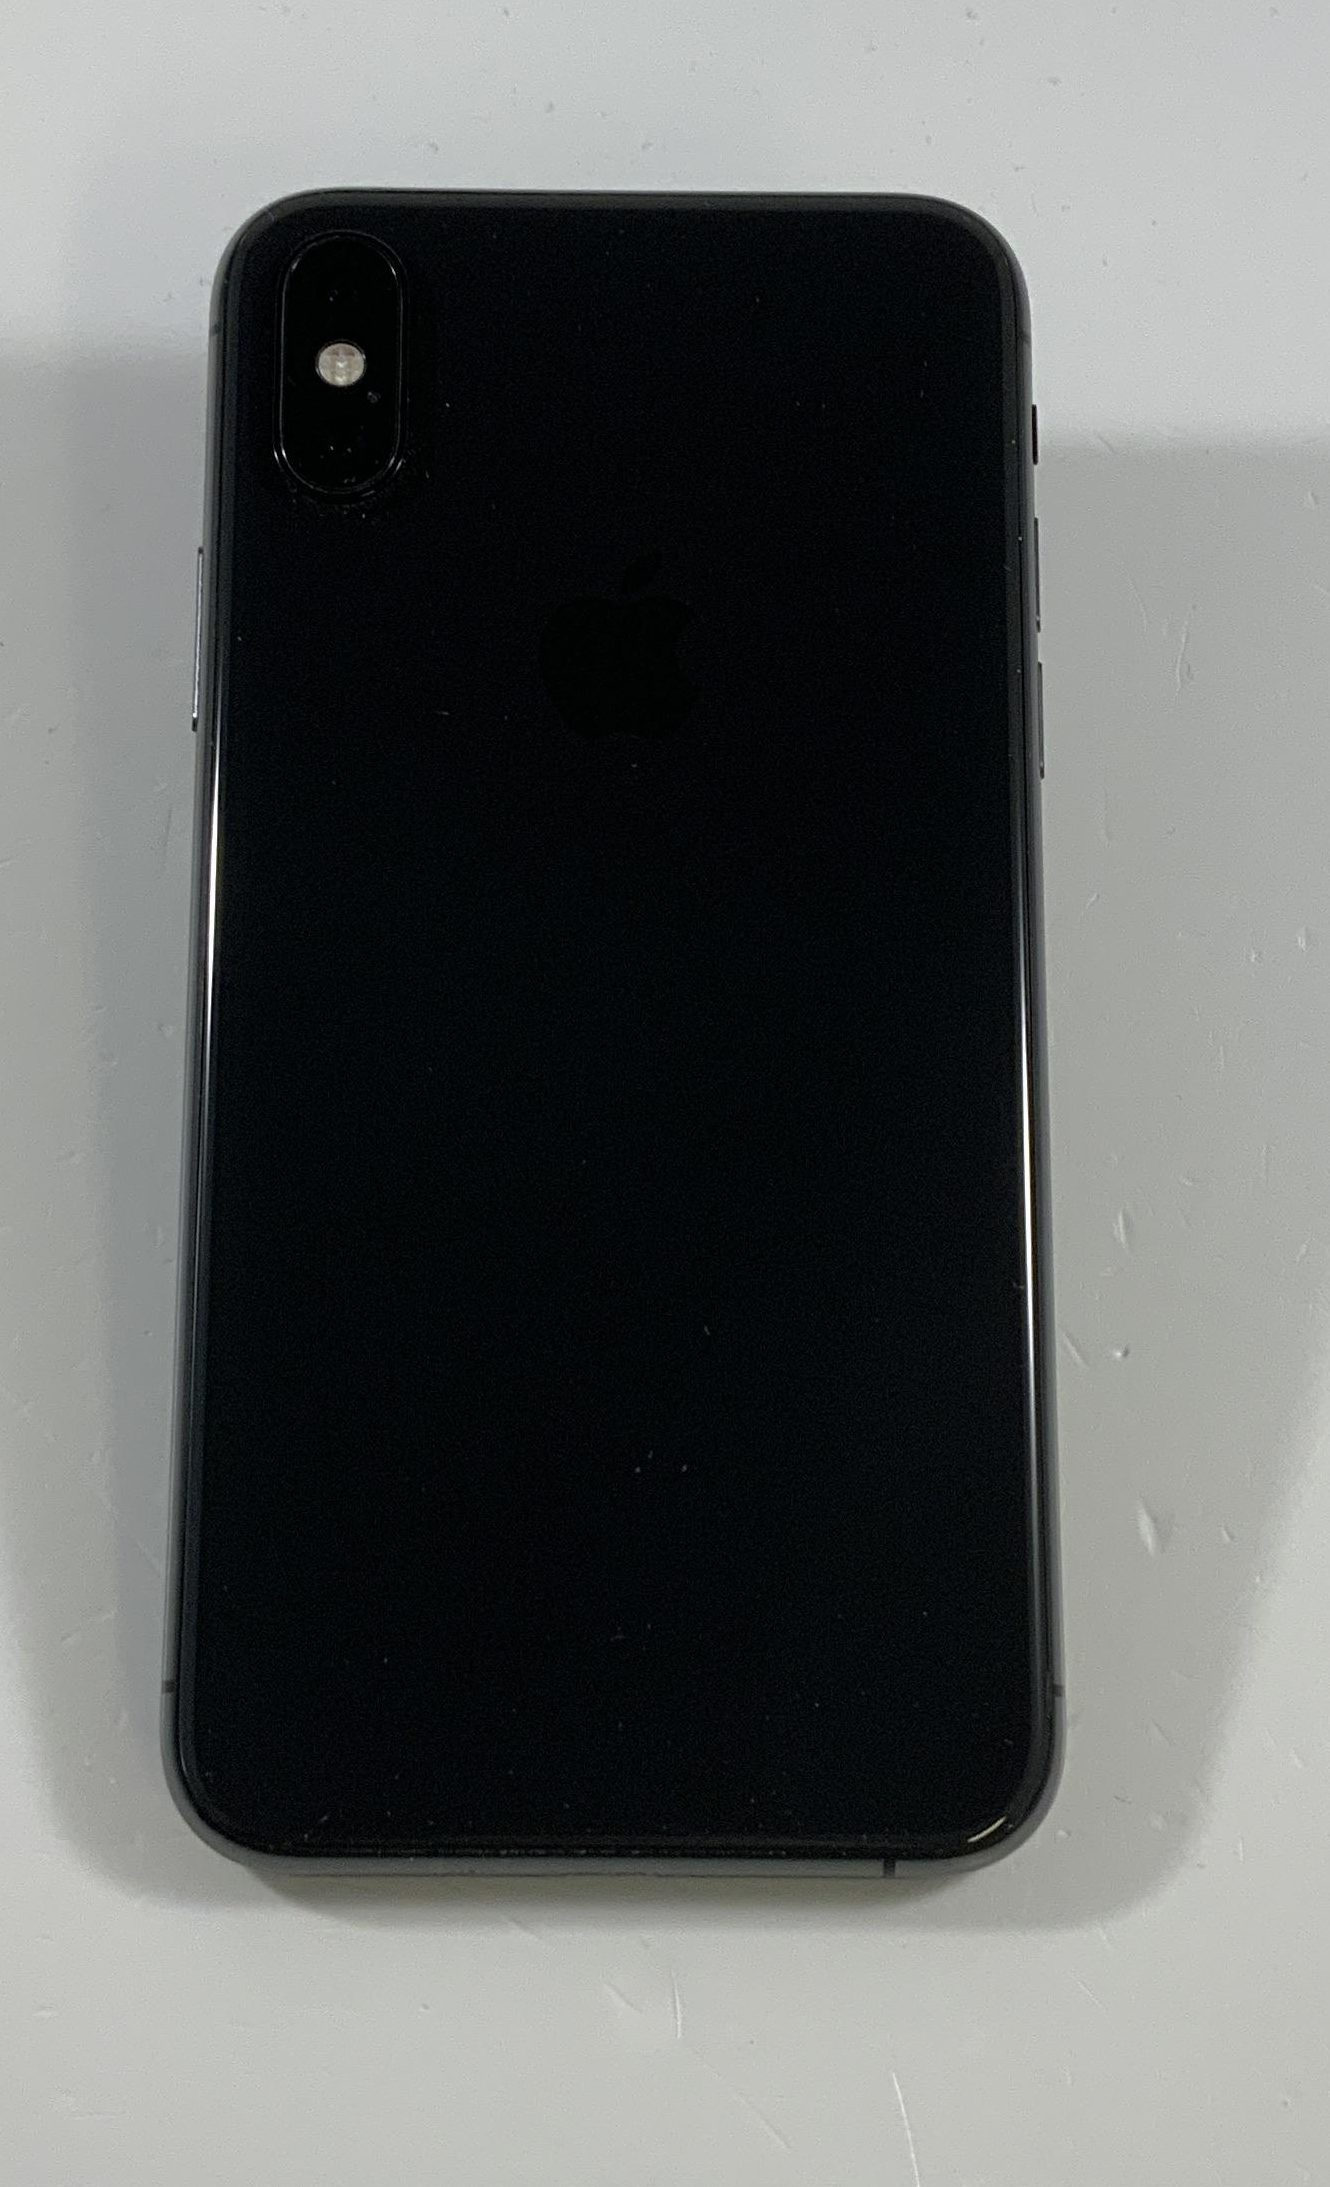 iPhone XS 64GB, 64GB, Space Gray, bild 2